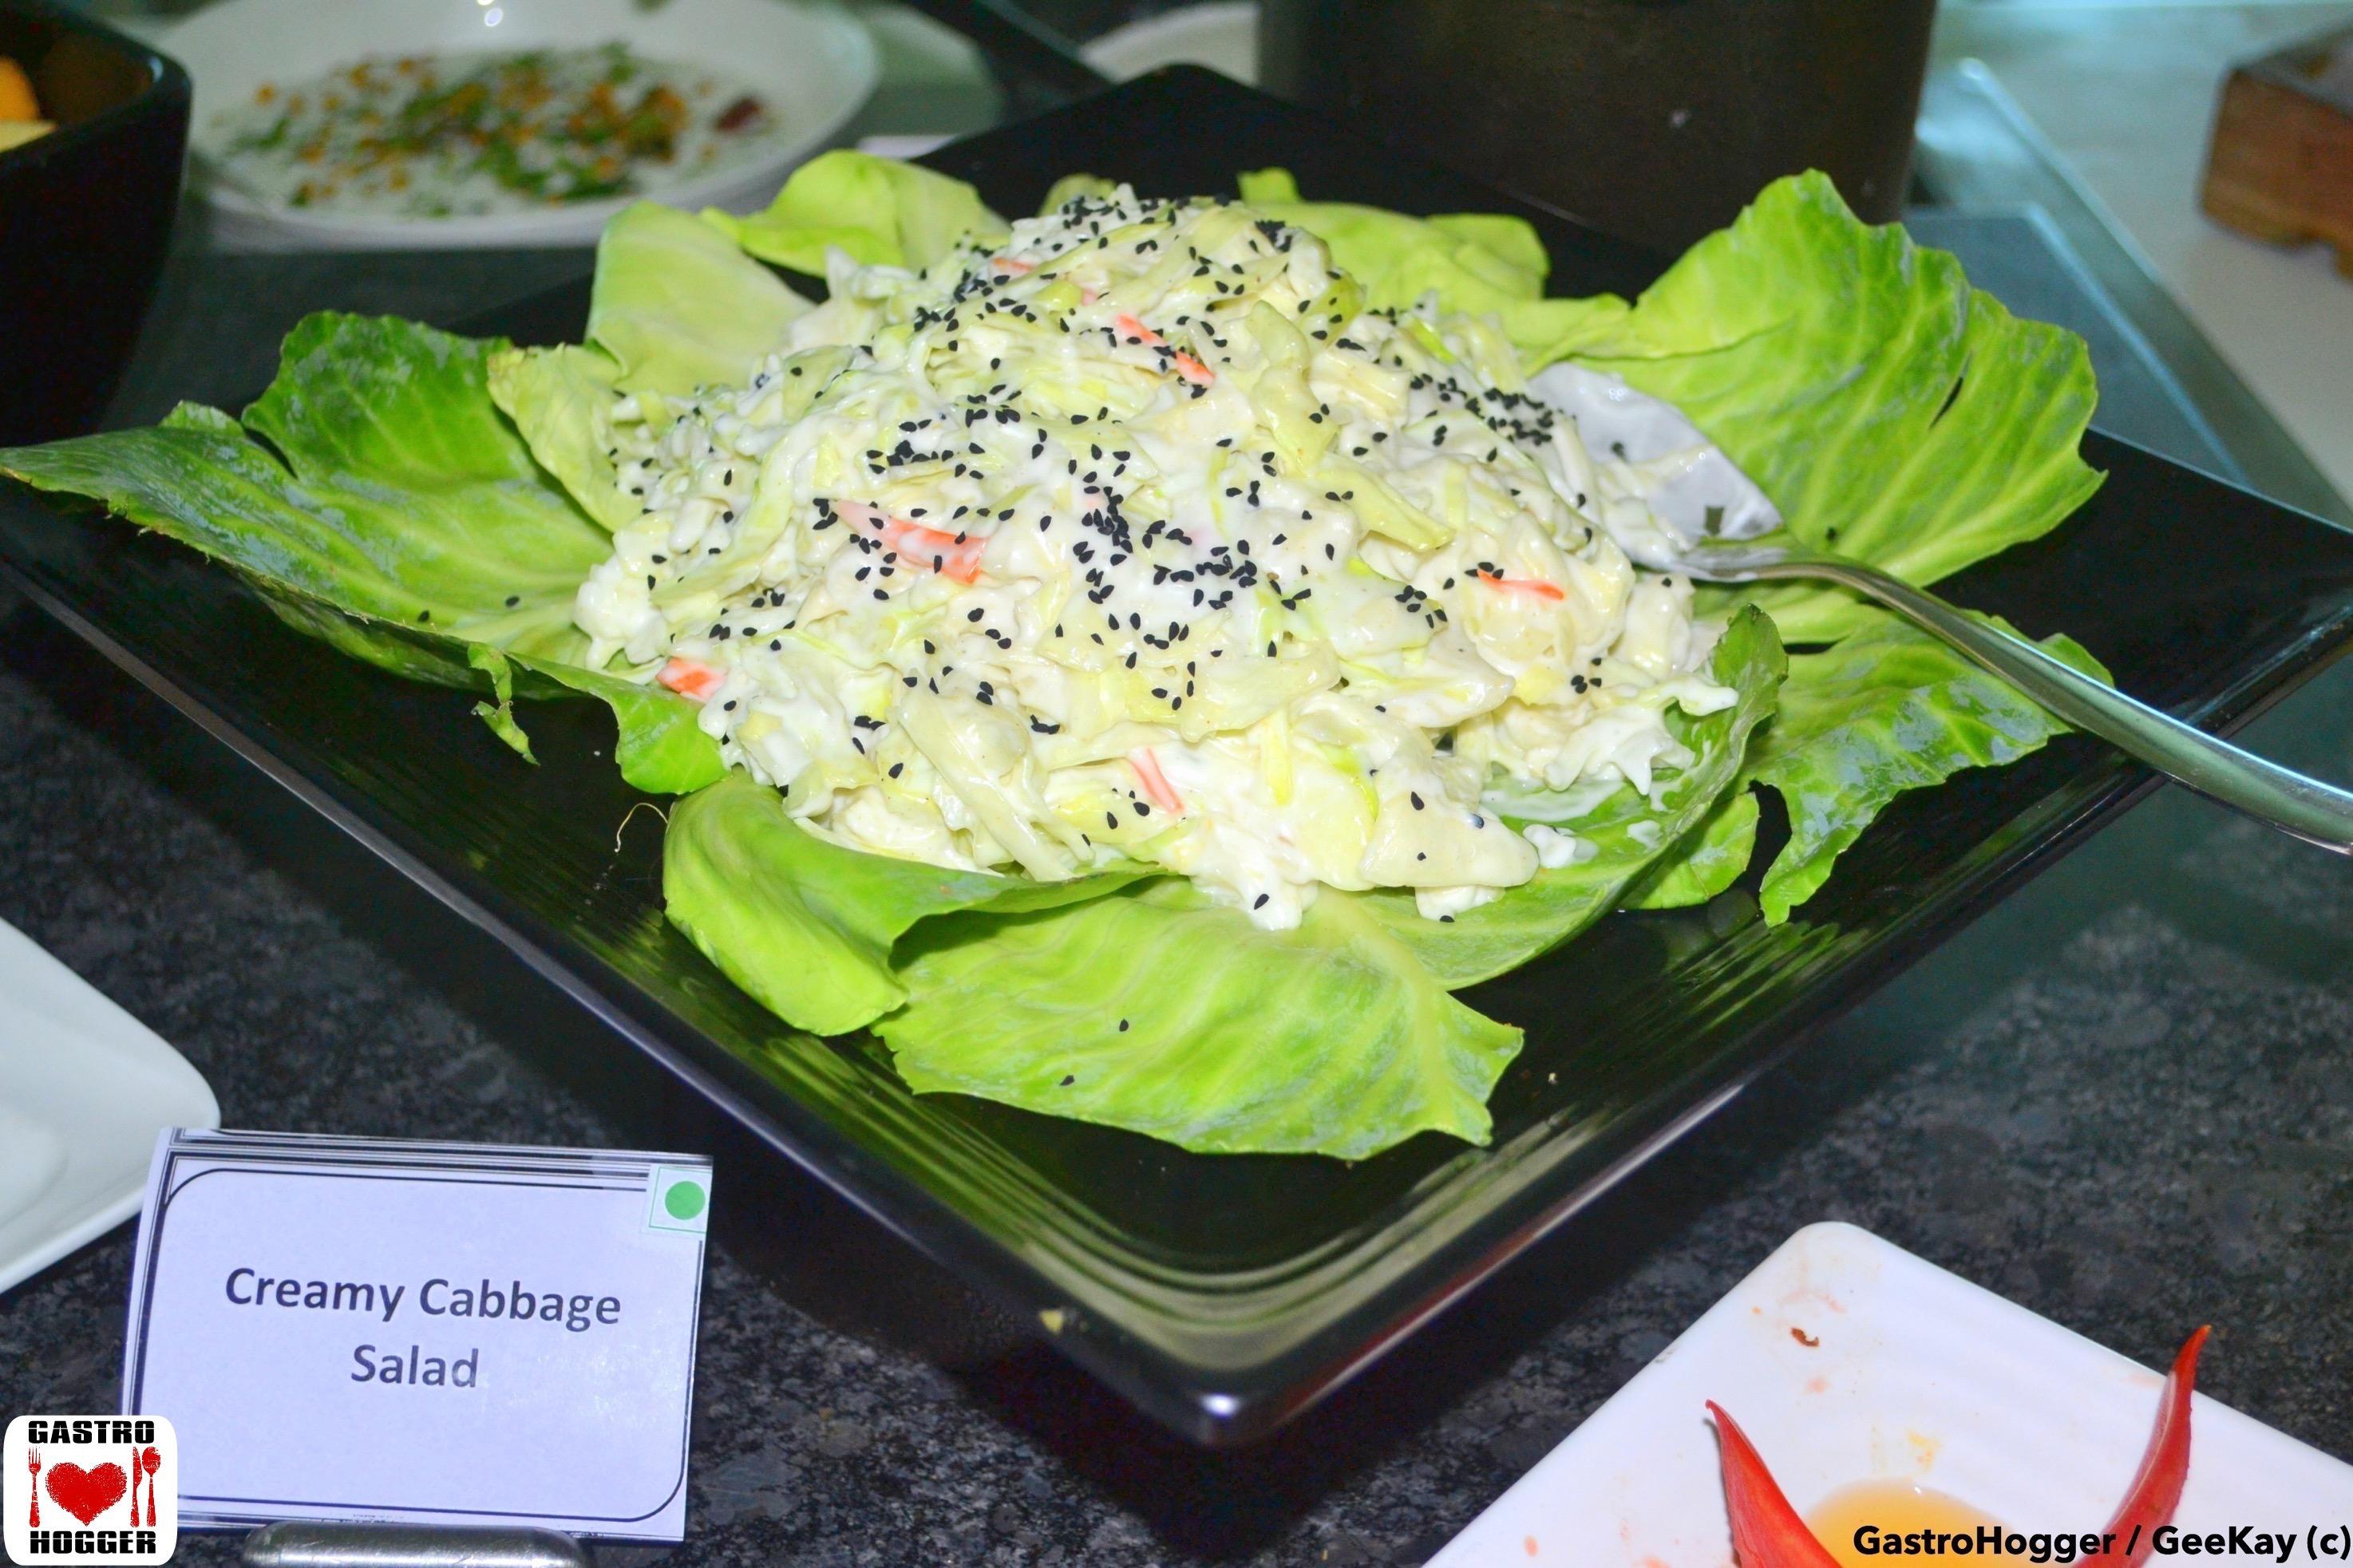 Creamy Cabbage Salad